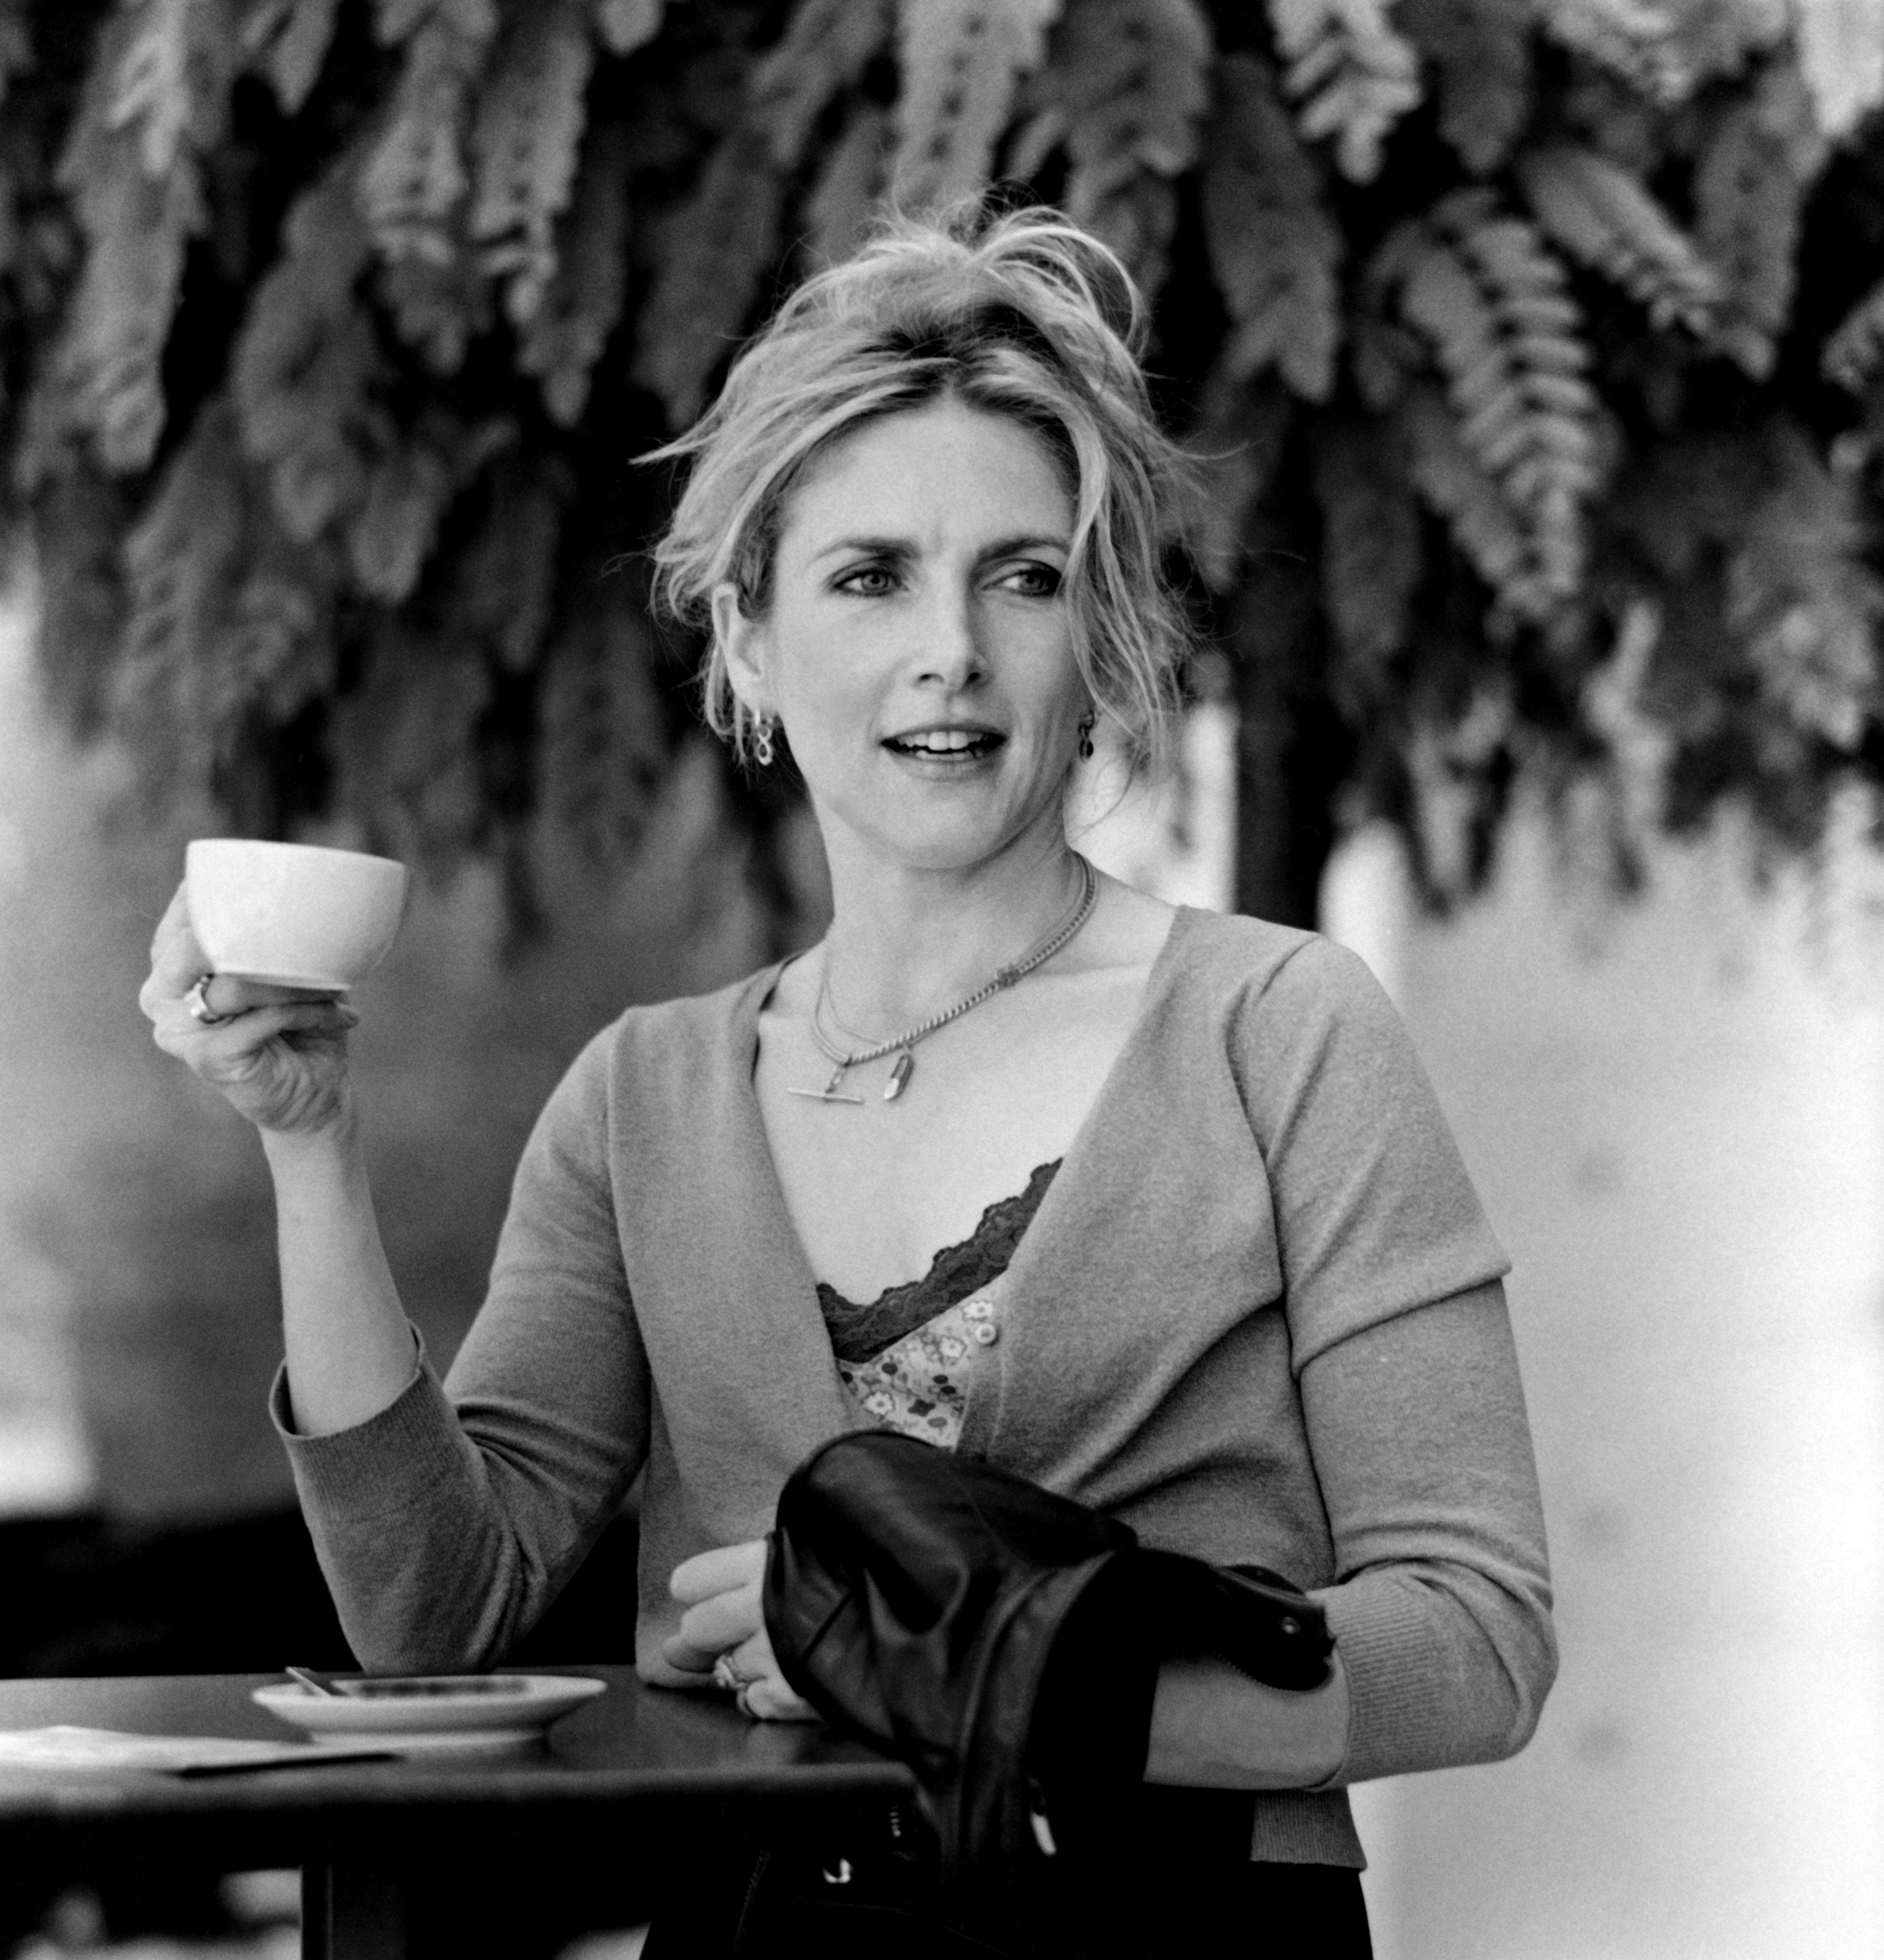 Jessica Durlacher trinkt Kaffee